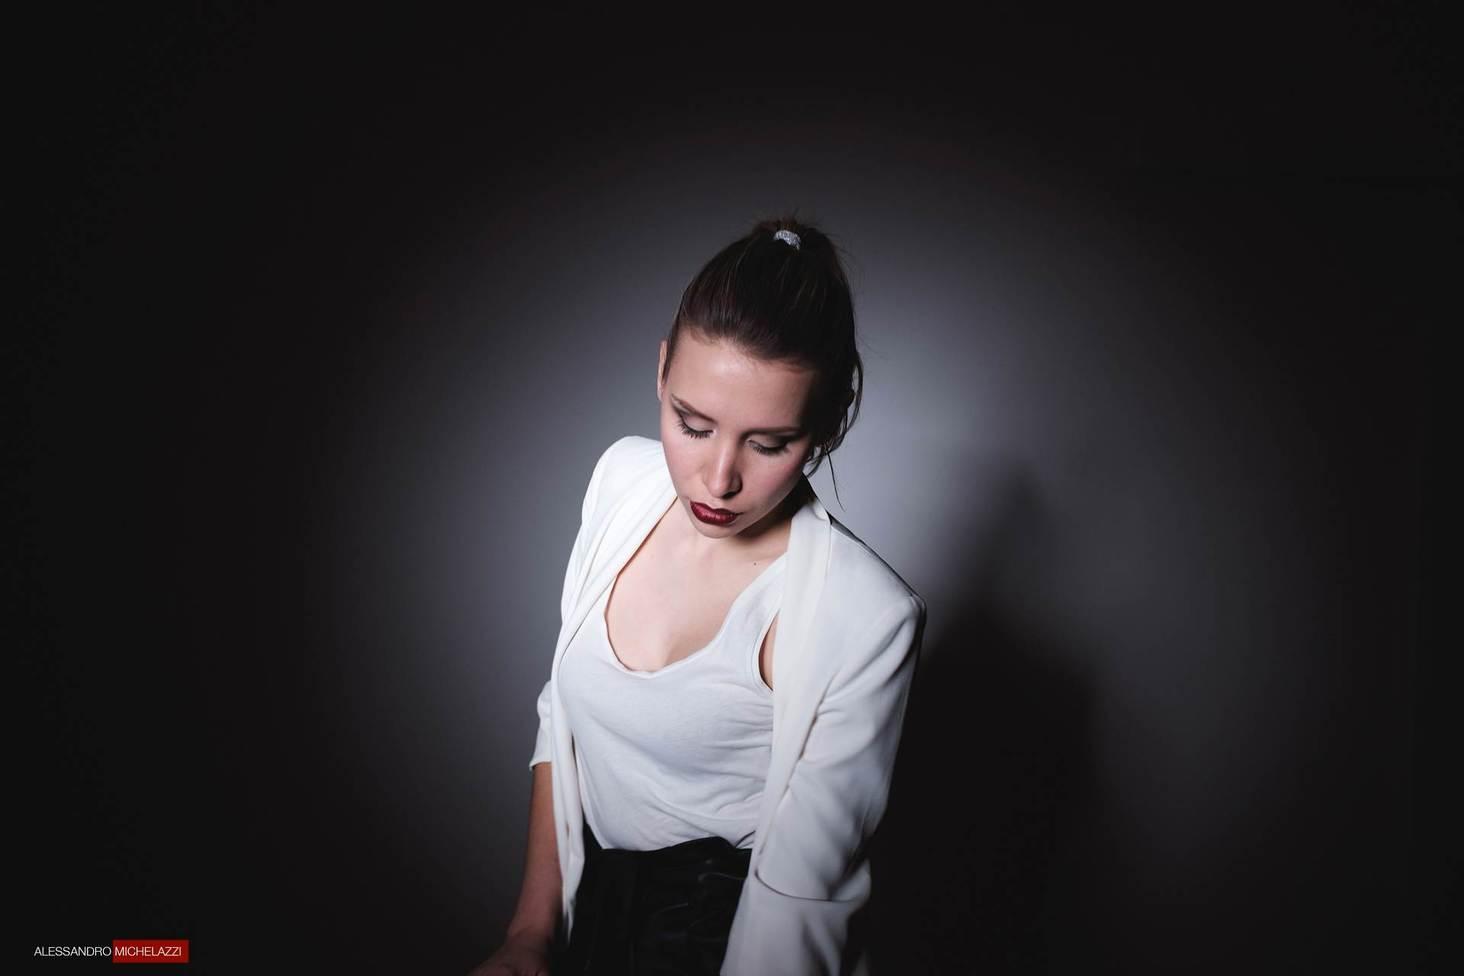 Alessandro Michelazzi Photography X70 Fashion Test